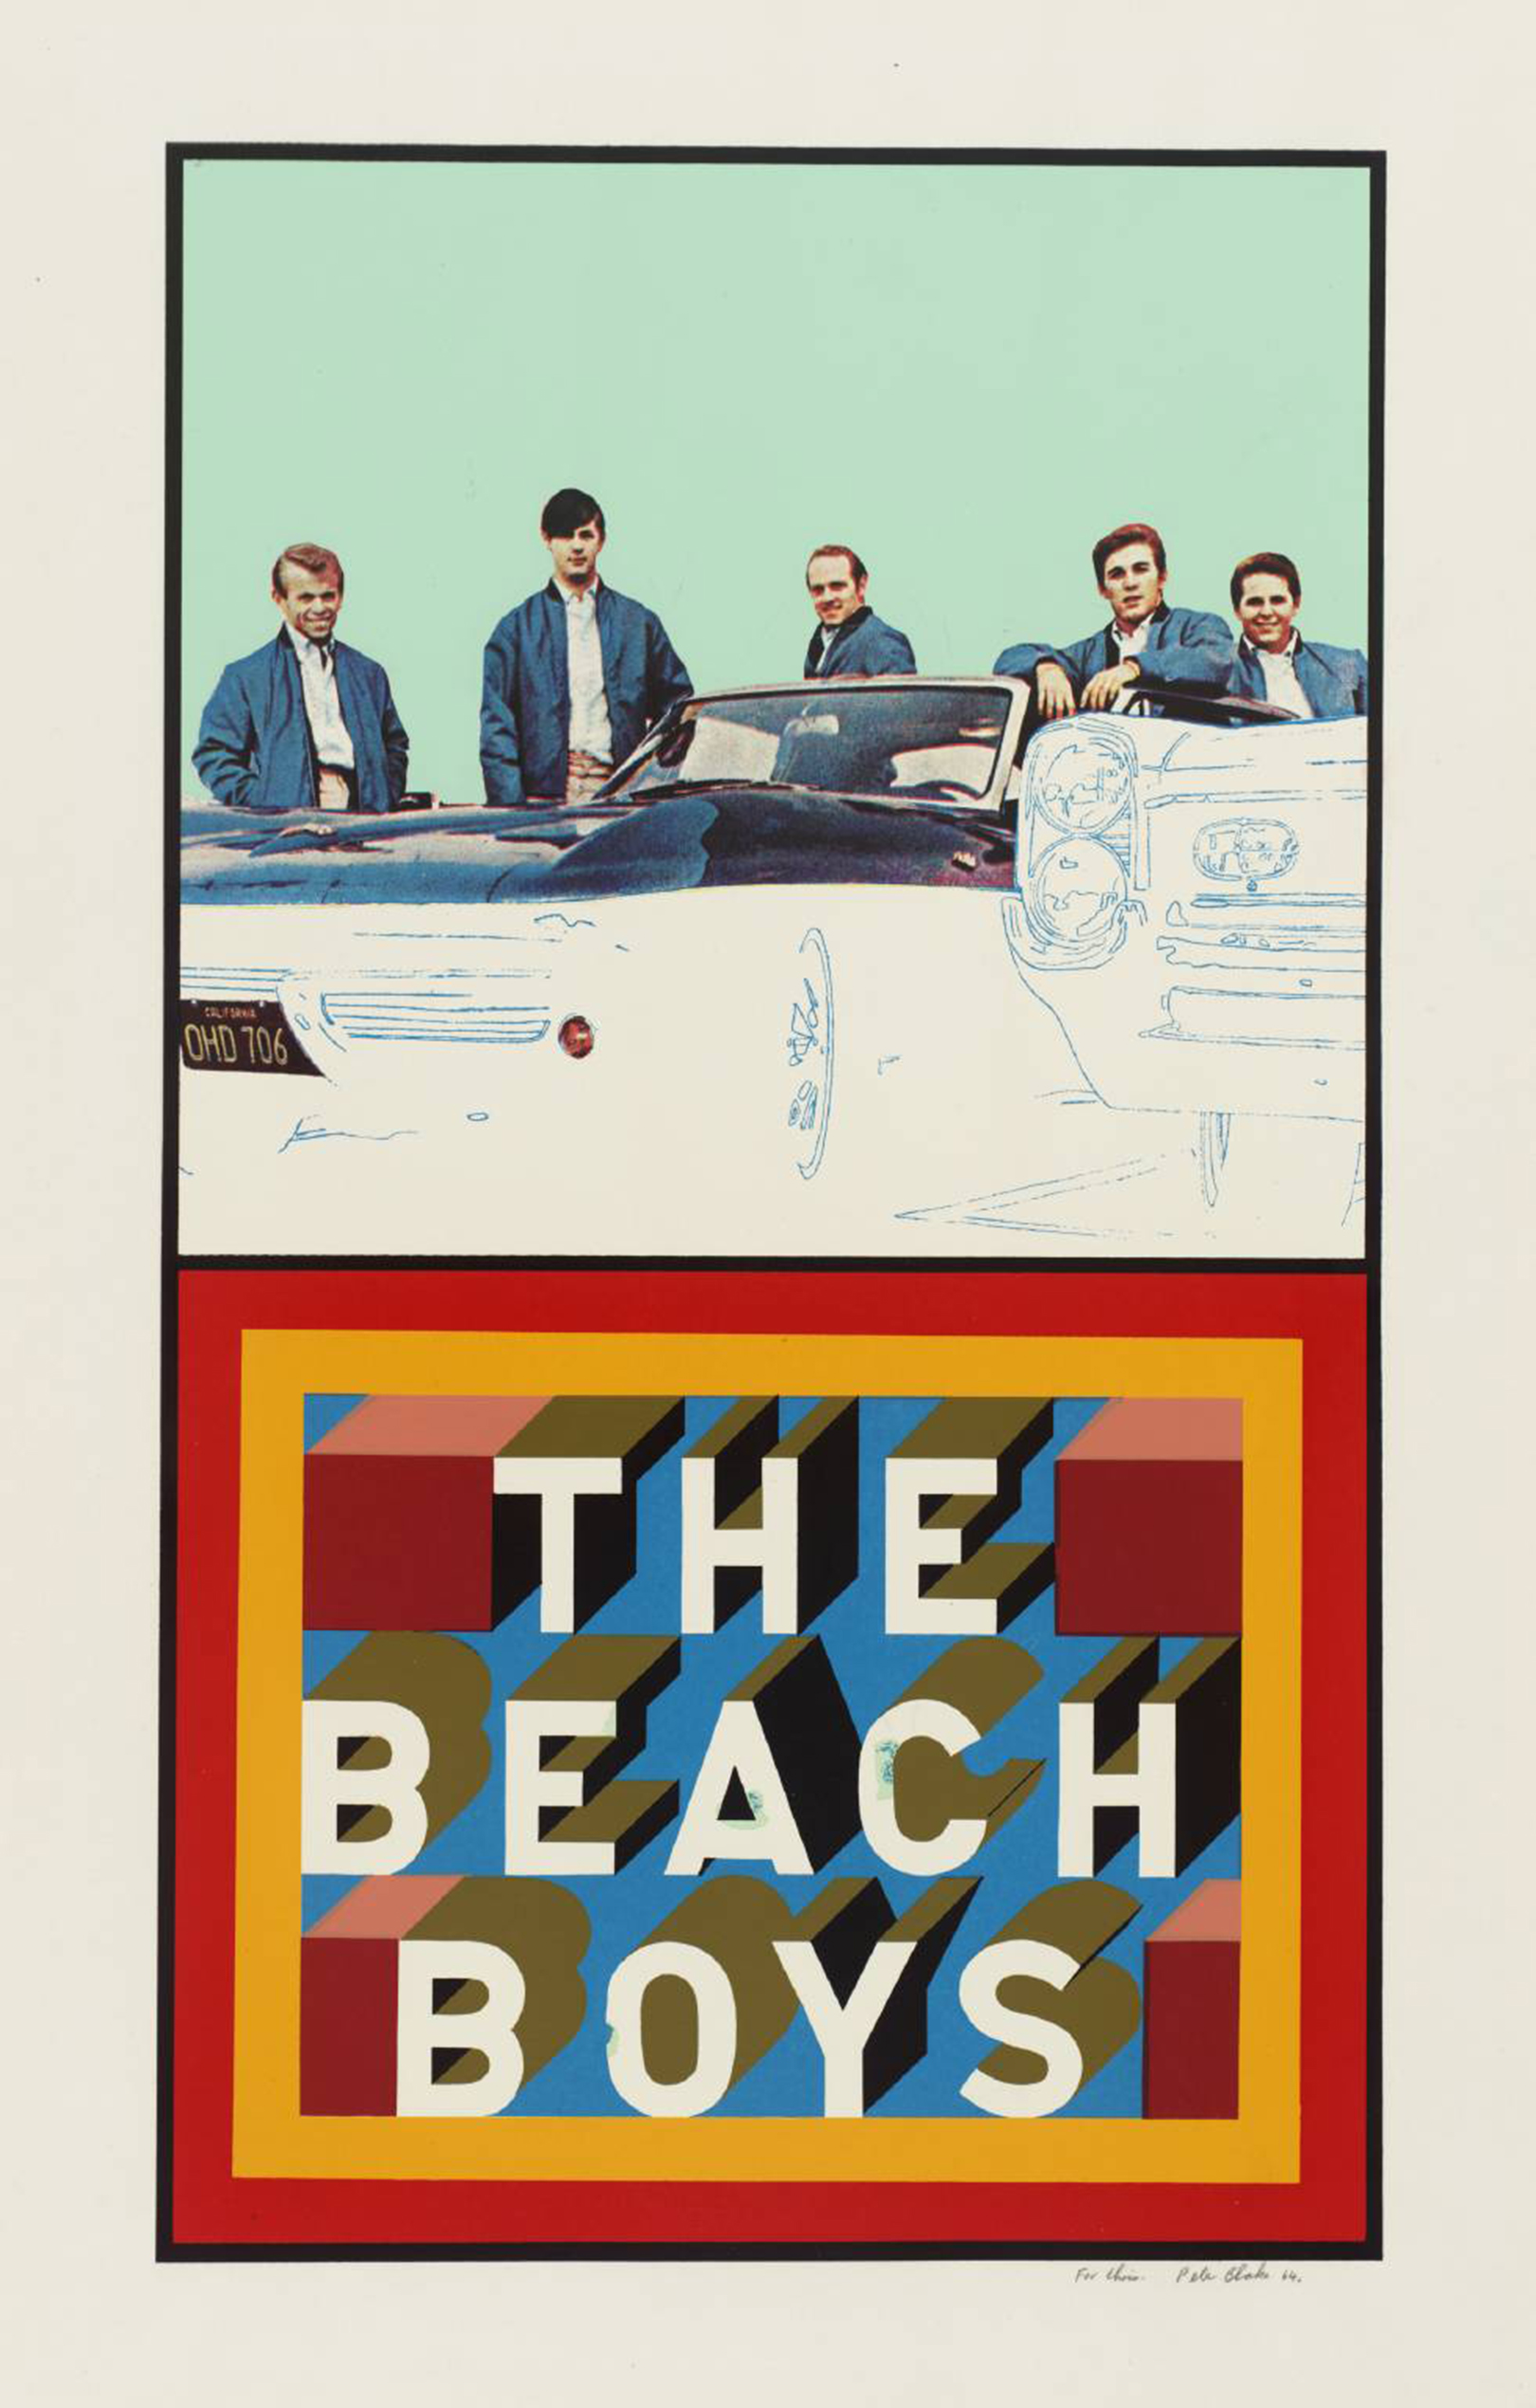 Beach Boys 1964 by Peter Blake